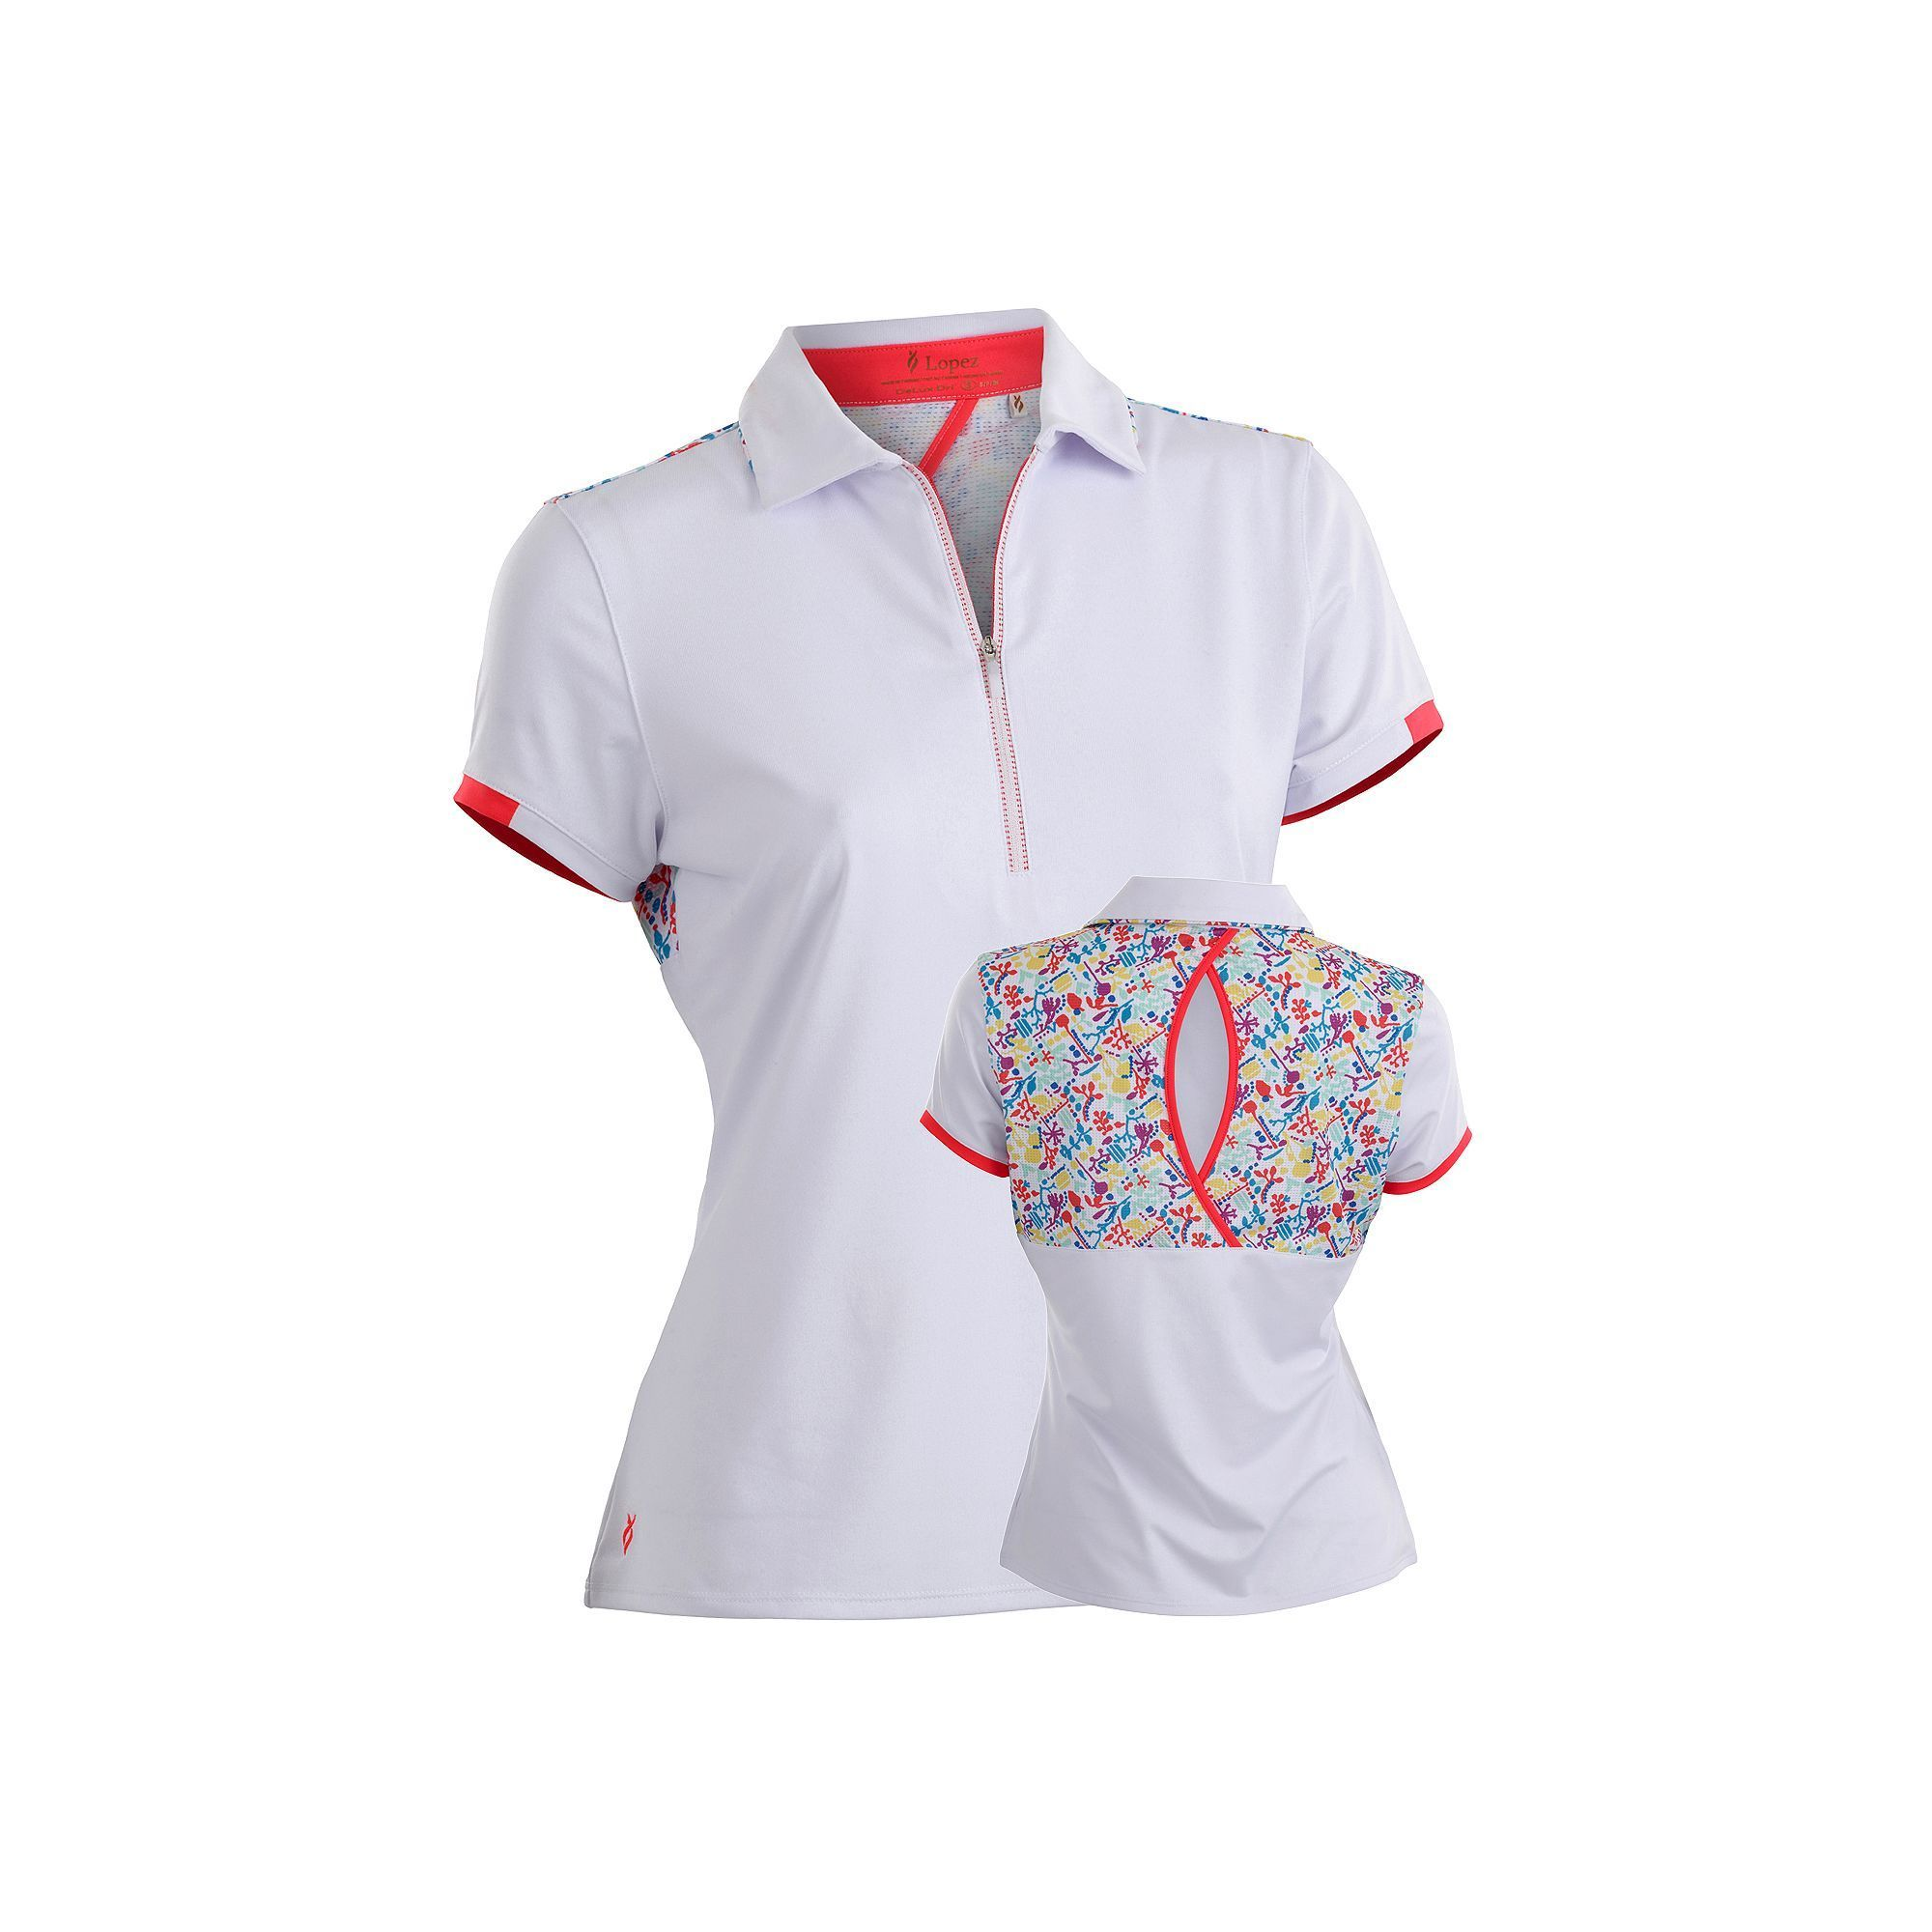 Plus Size Womens Golf Polo Shirts